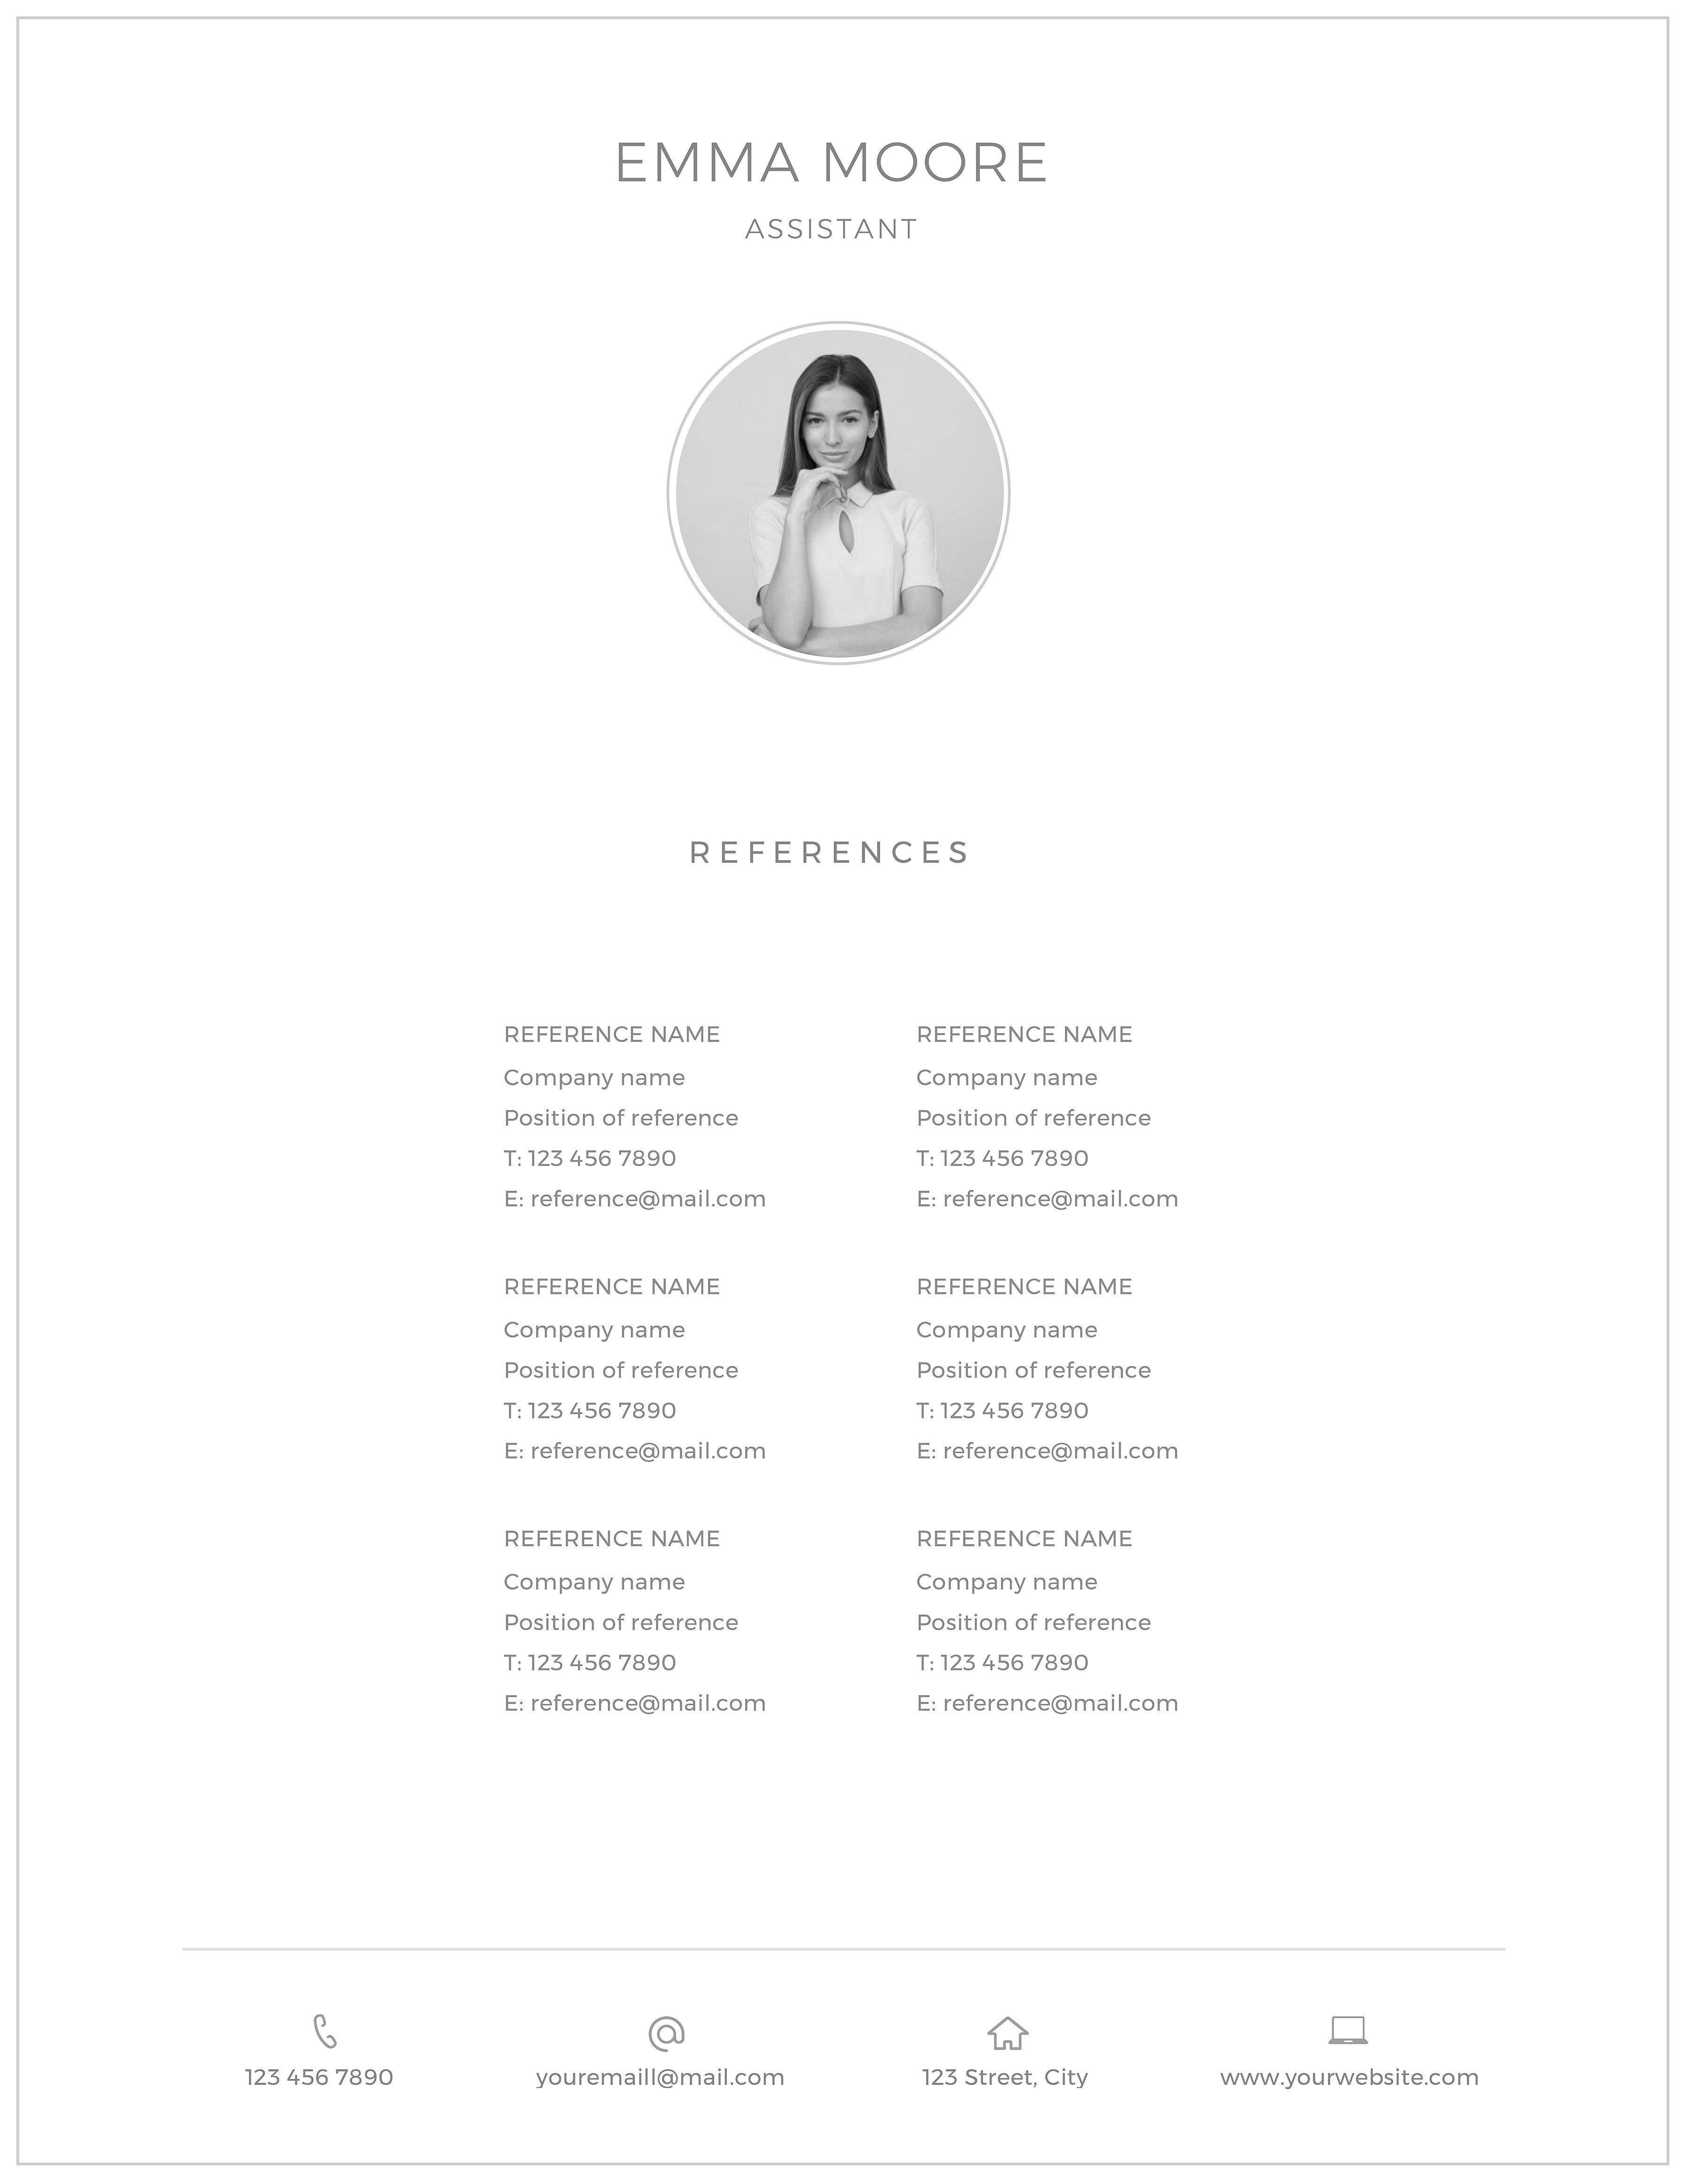 Resume Template / CV Resume template, Free resume